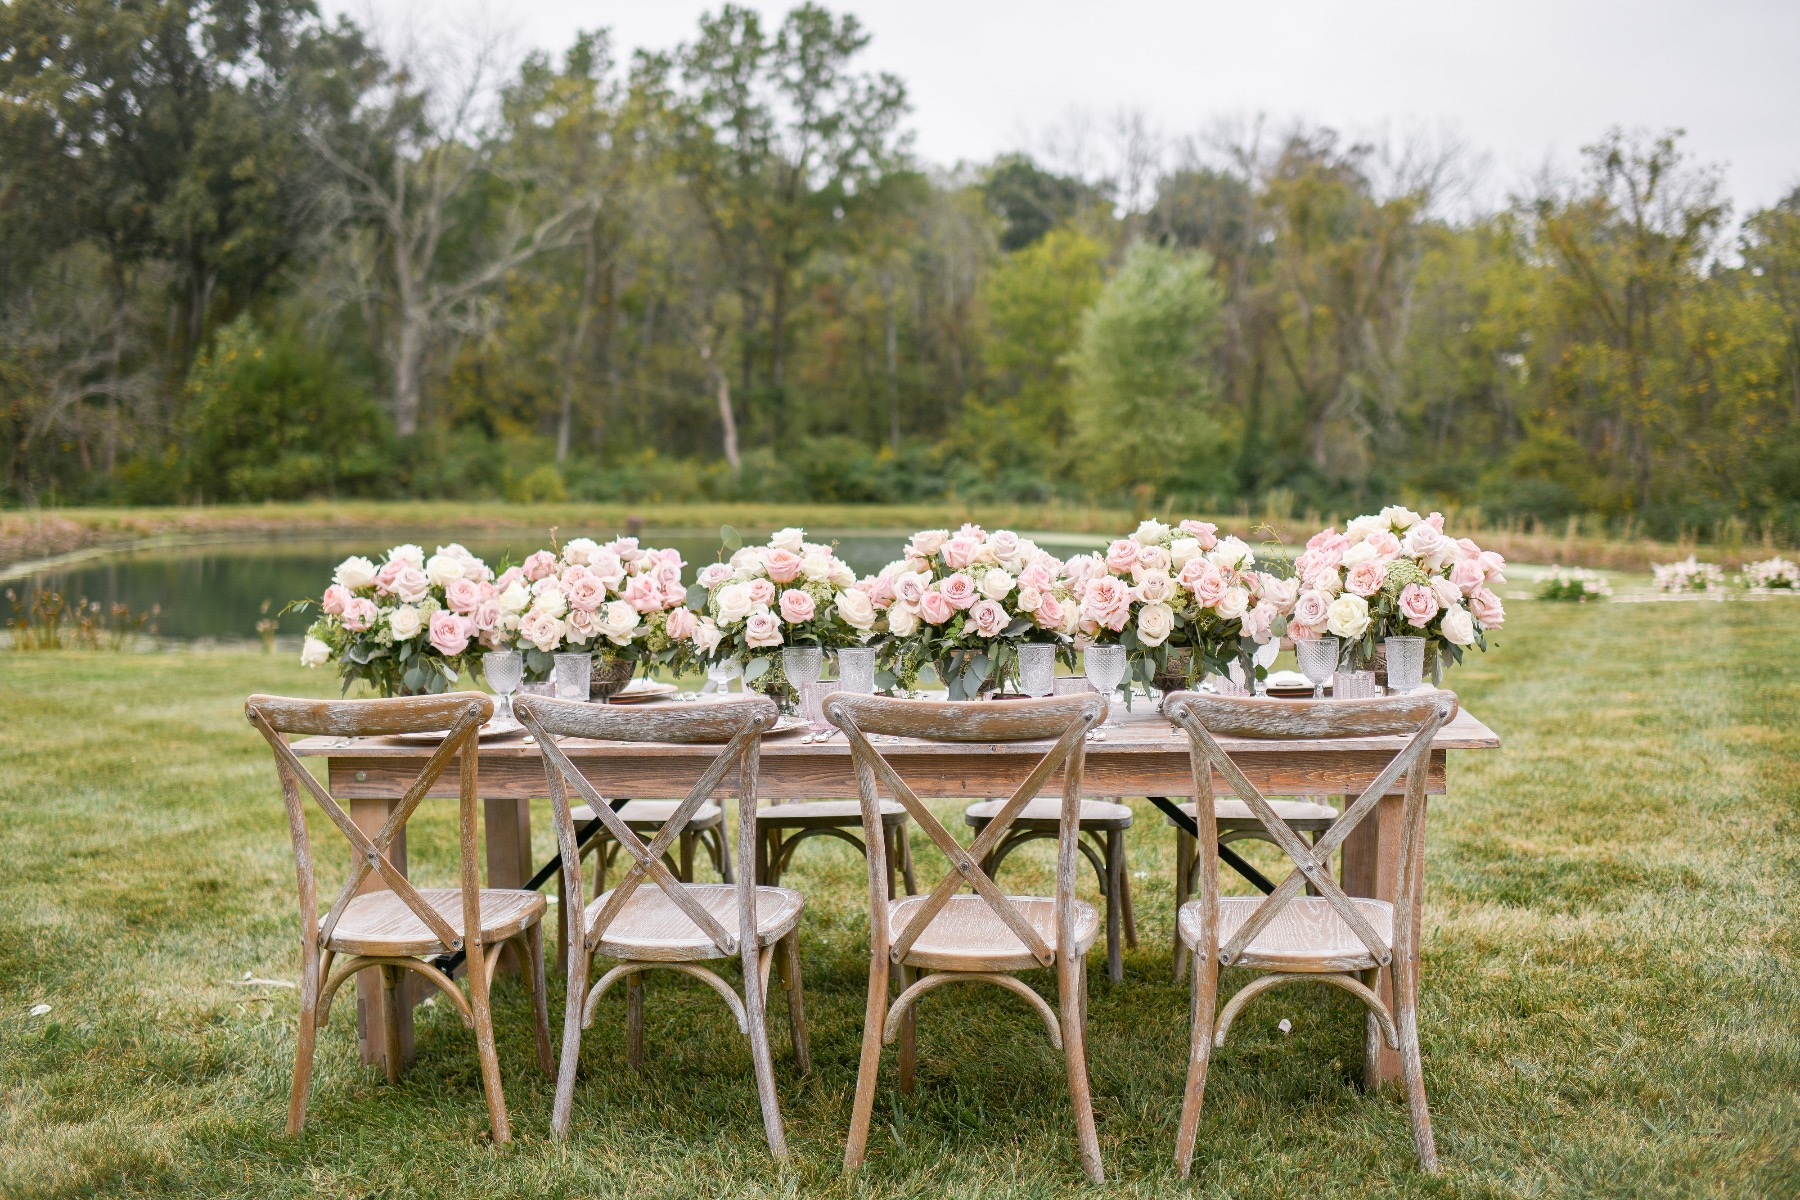 Enchanted Romantic Bellevue Roses Wedding 2021